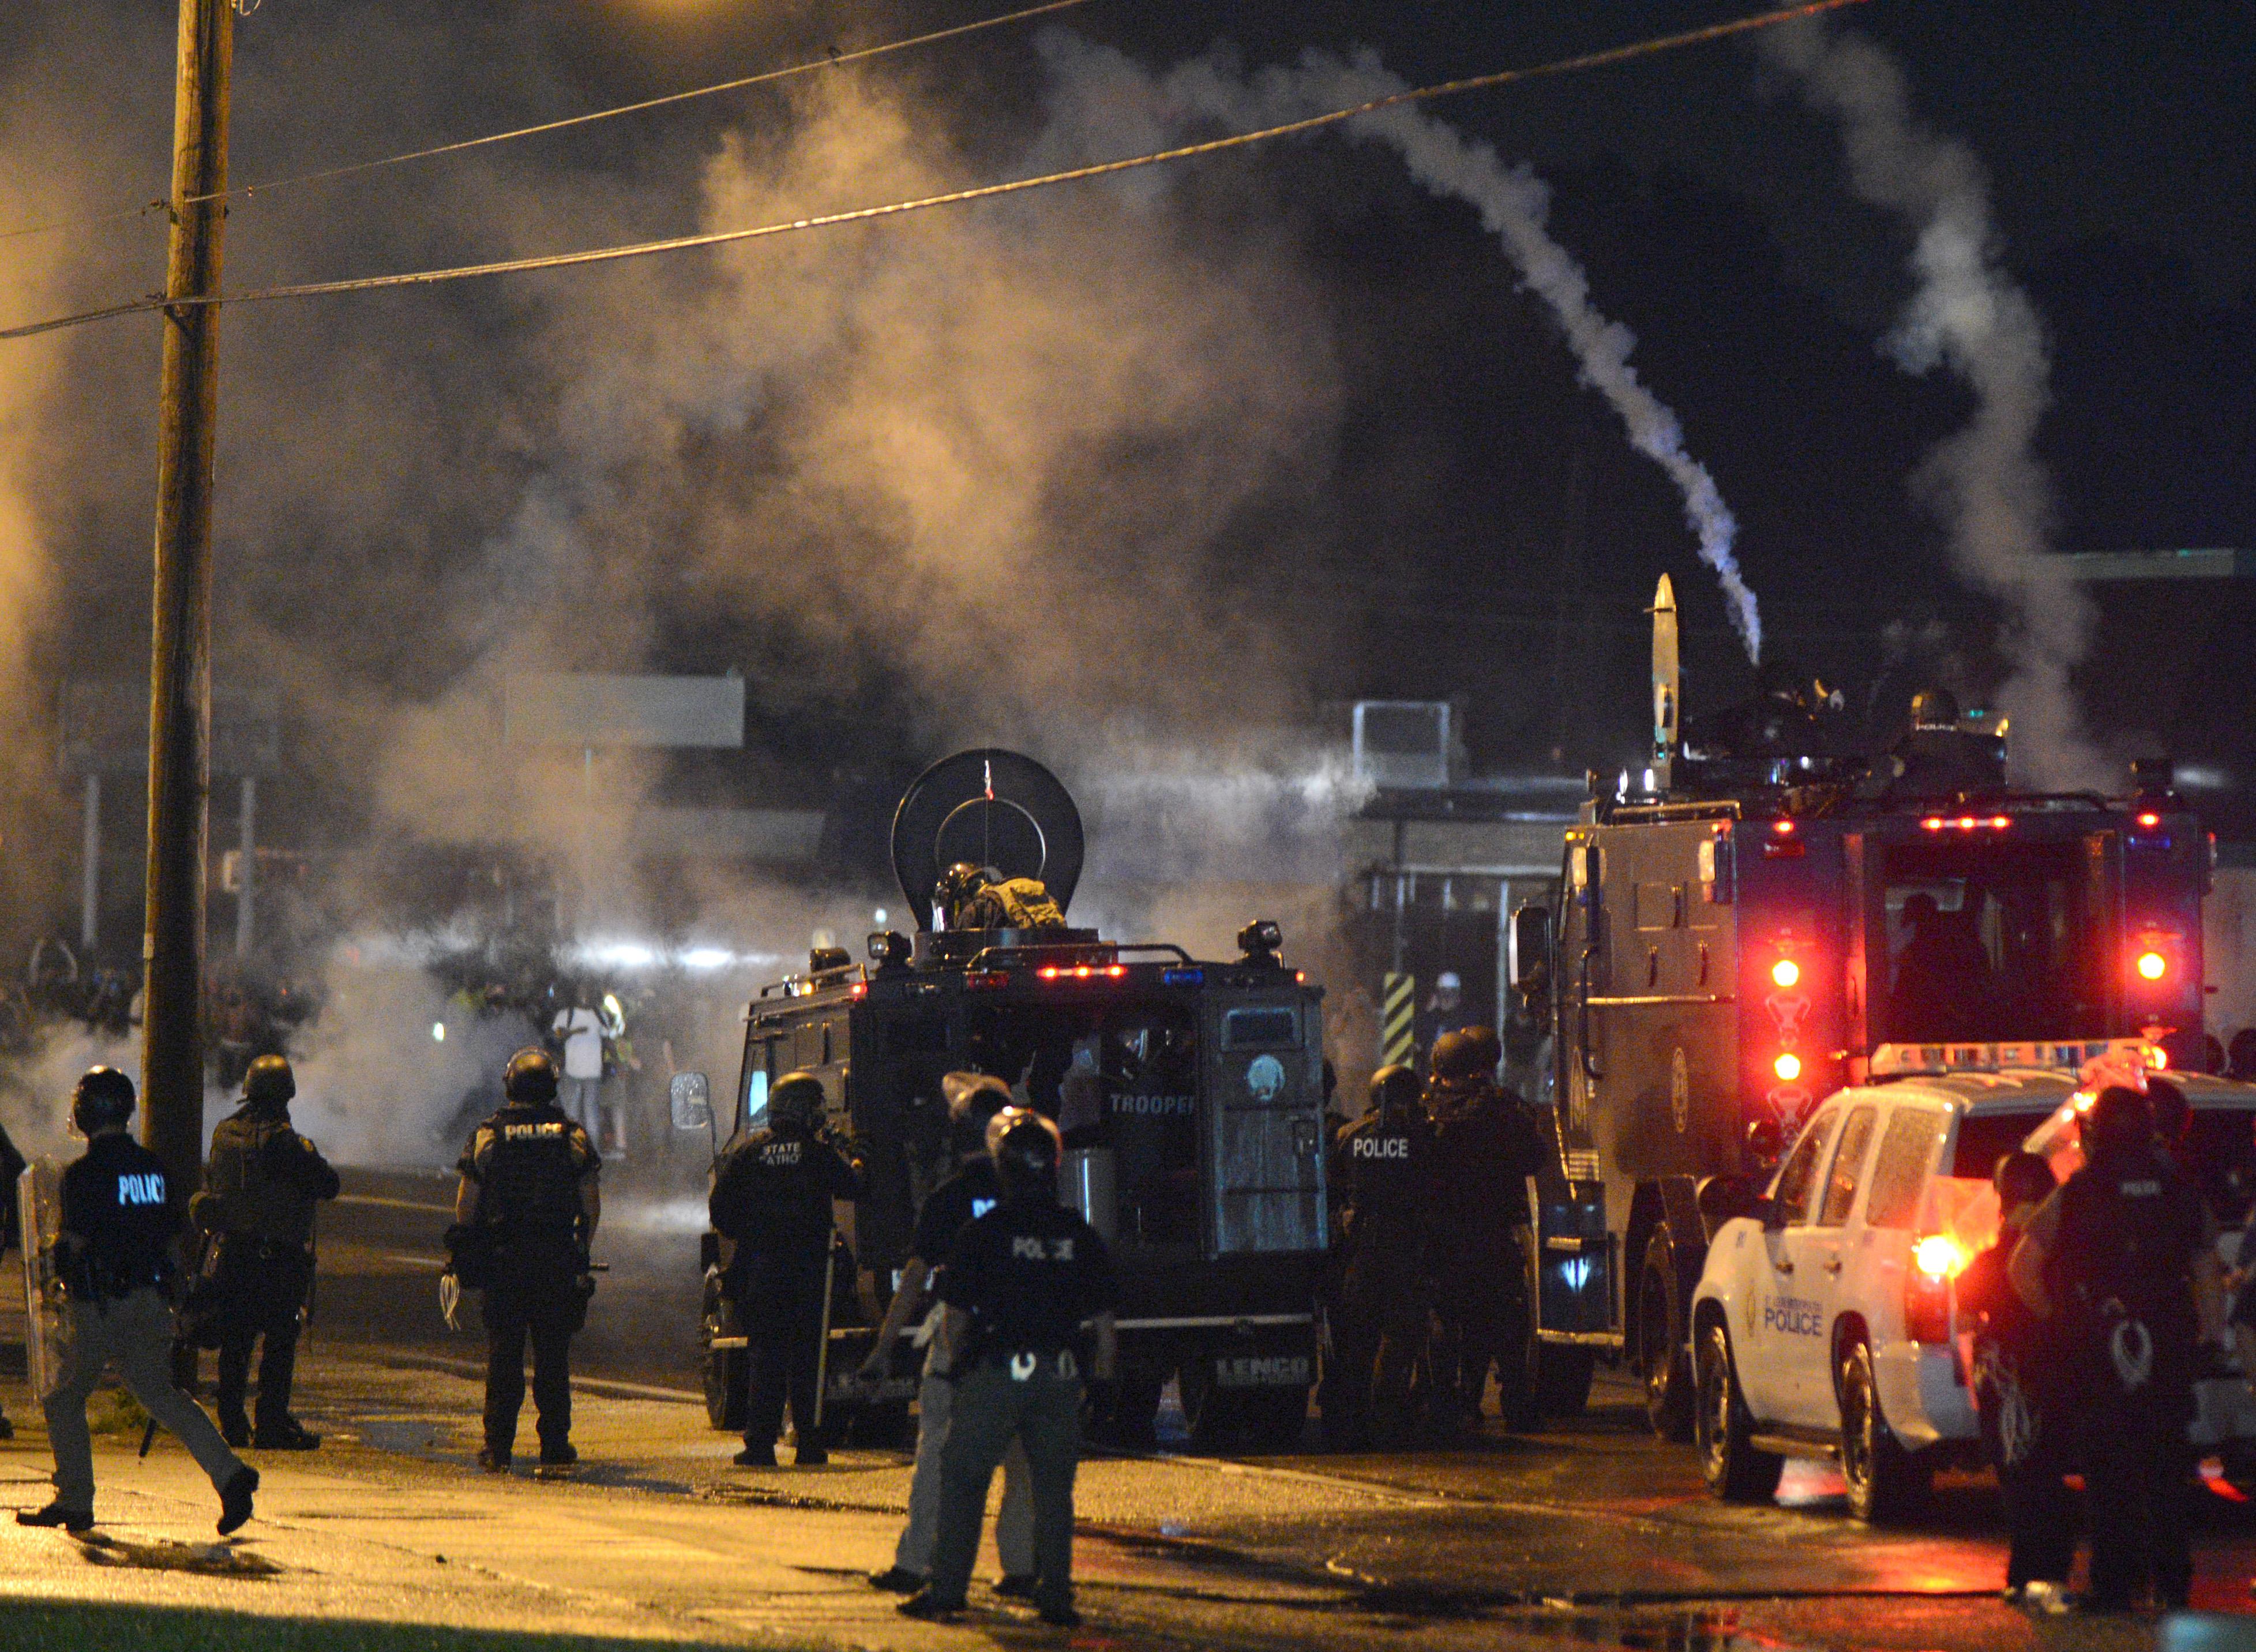 Ferguson, MO - Gunfire Erupts As Protesters Flee In ...